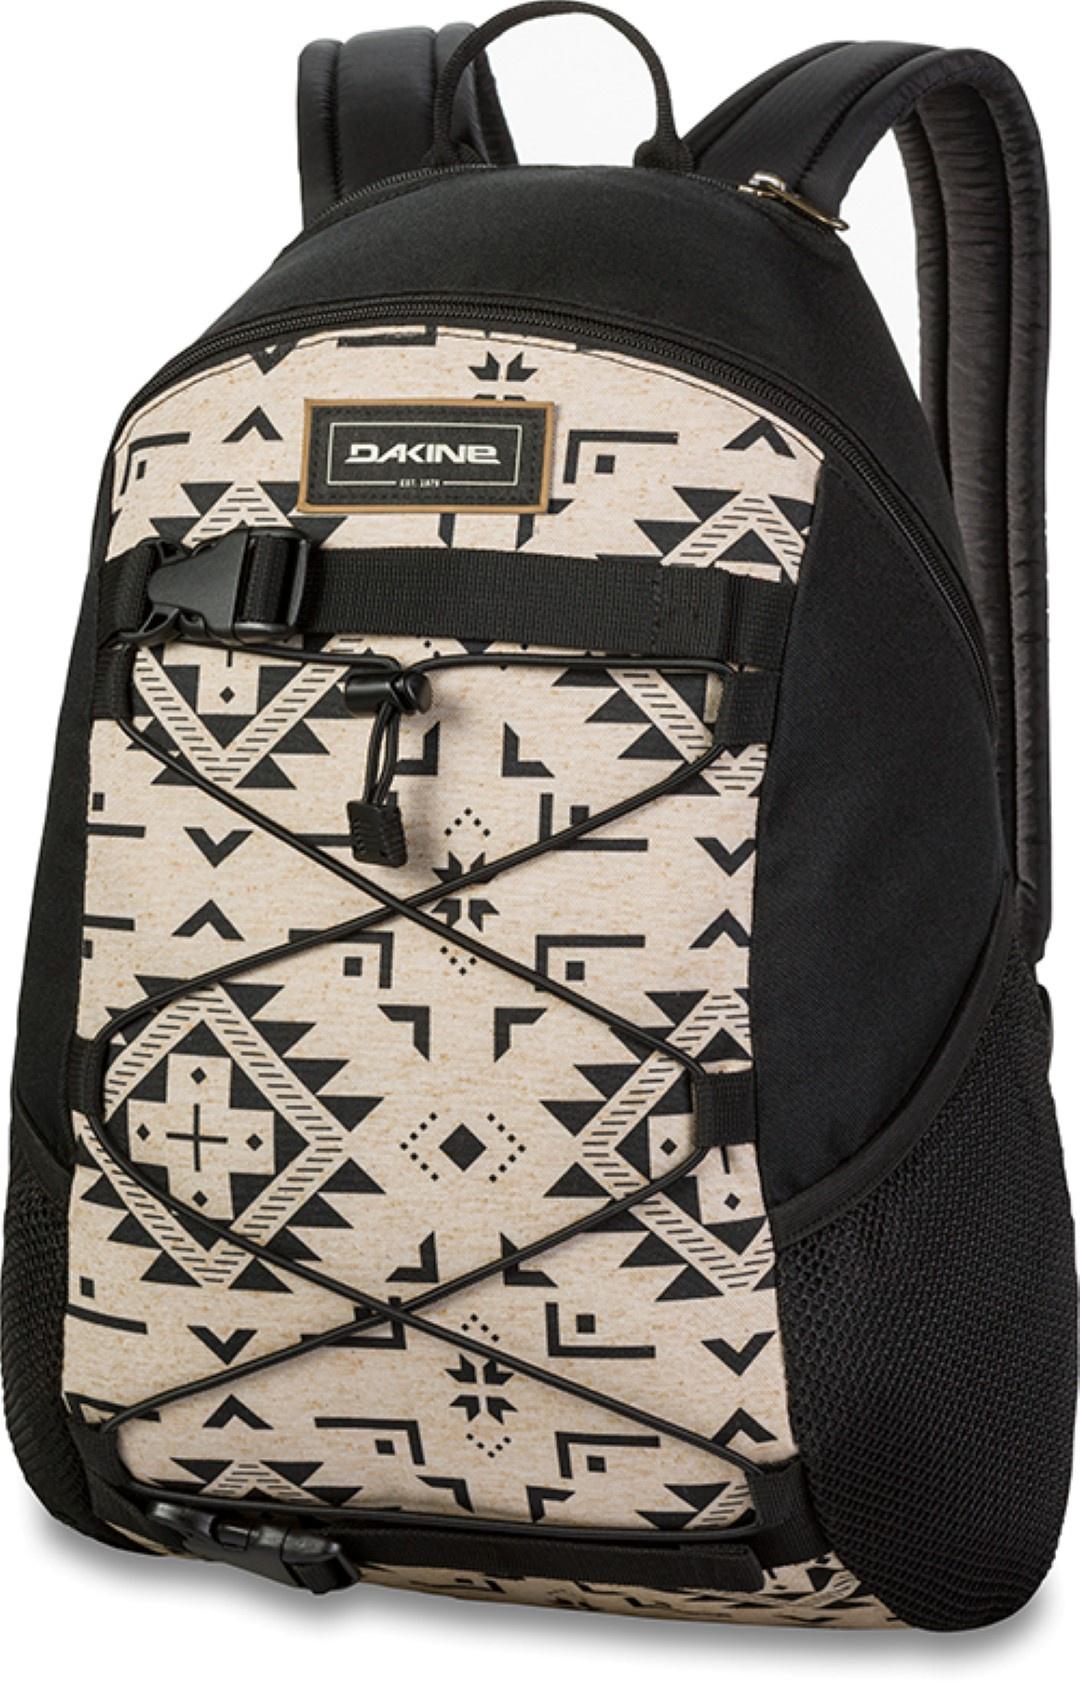 Рюкзак DAKINE DAKINE-08130060, черный